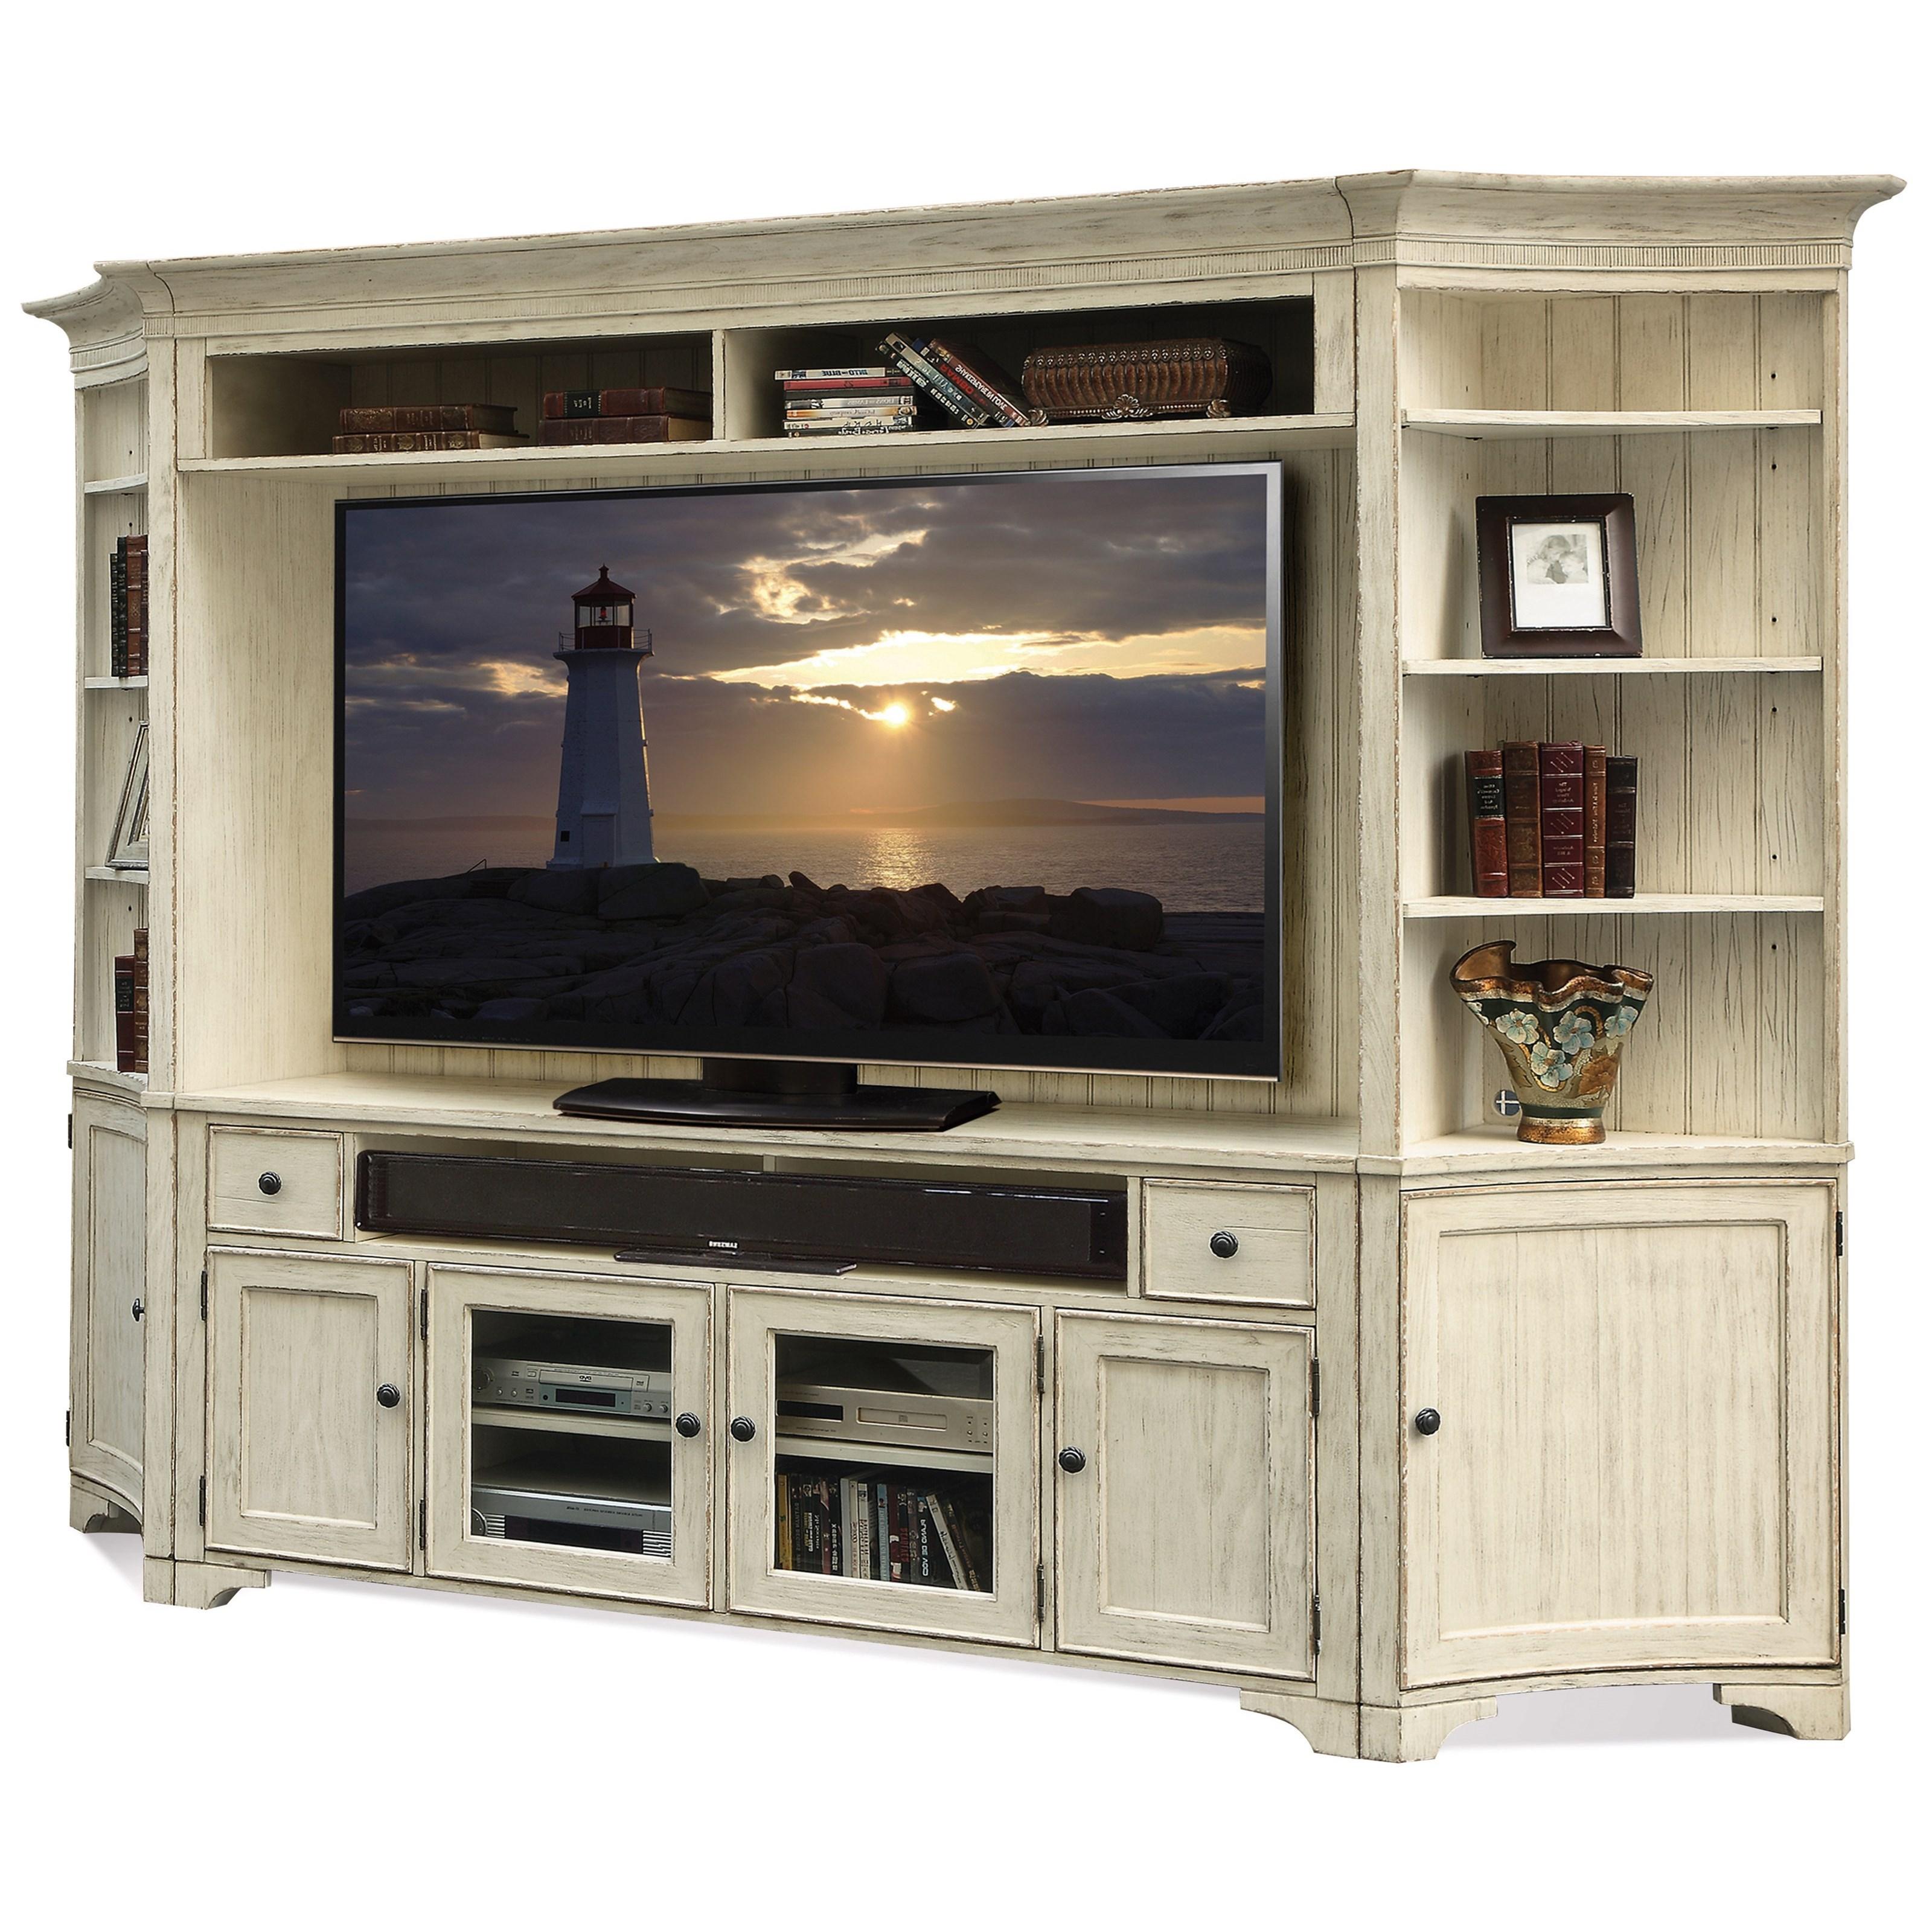 riverside furniture aberdeen wall unit in weathered worn white finish - Riverside Furniture